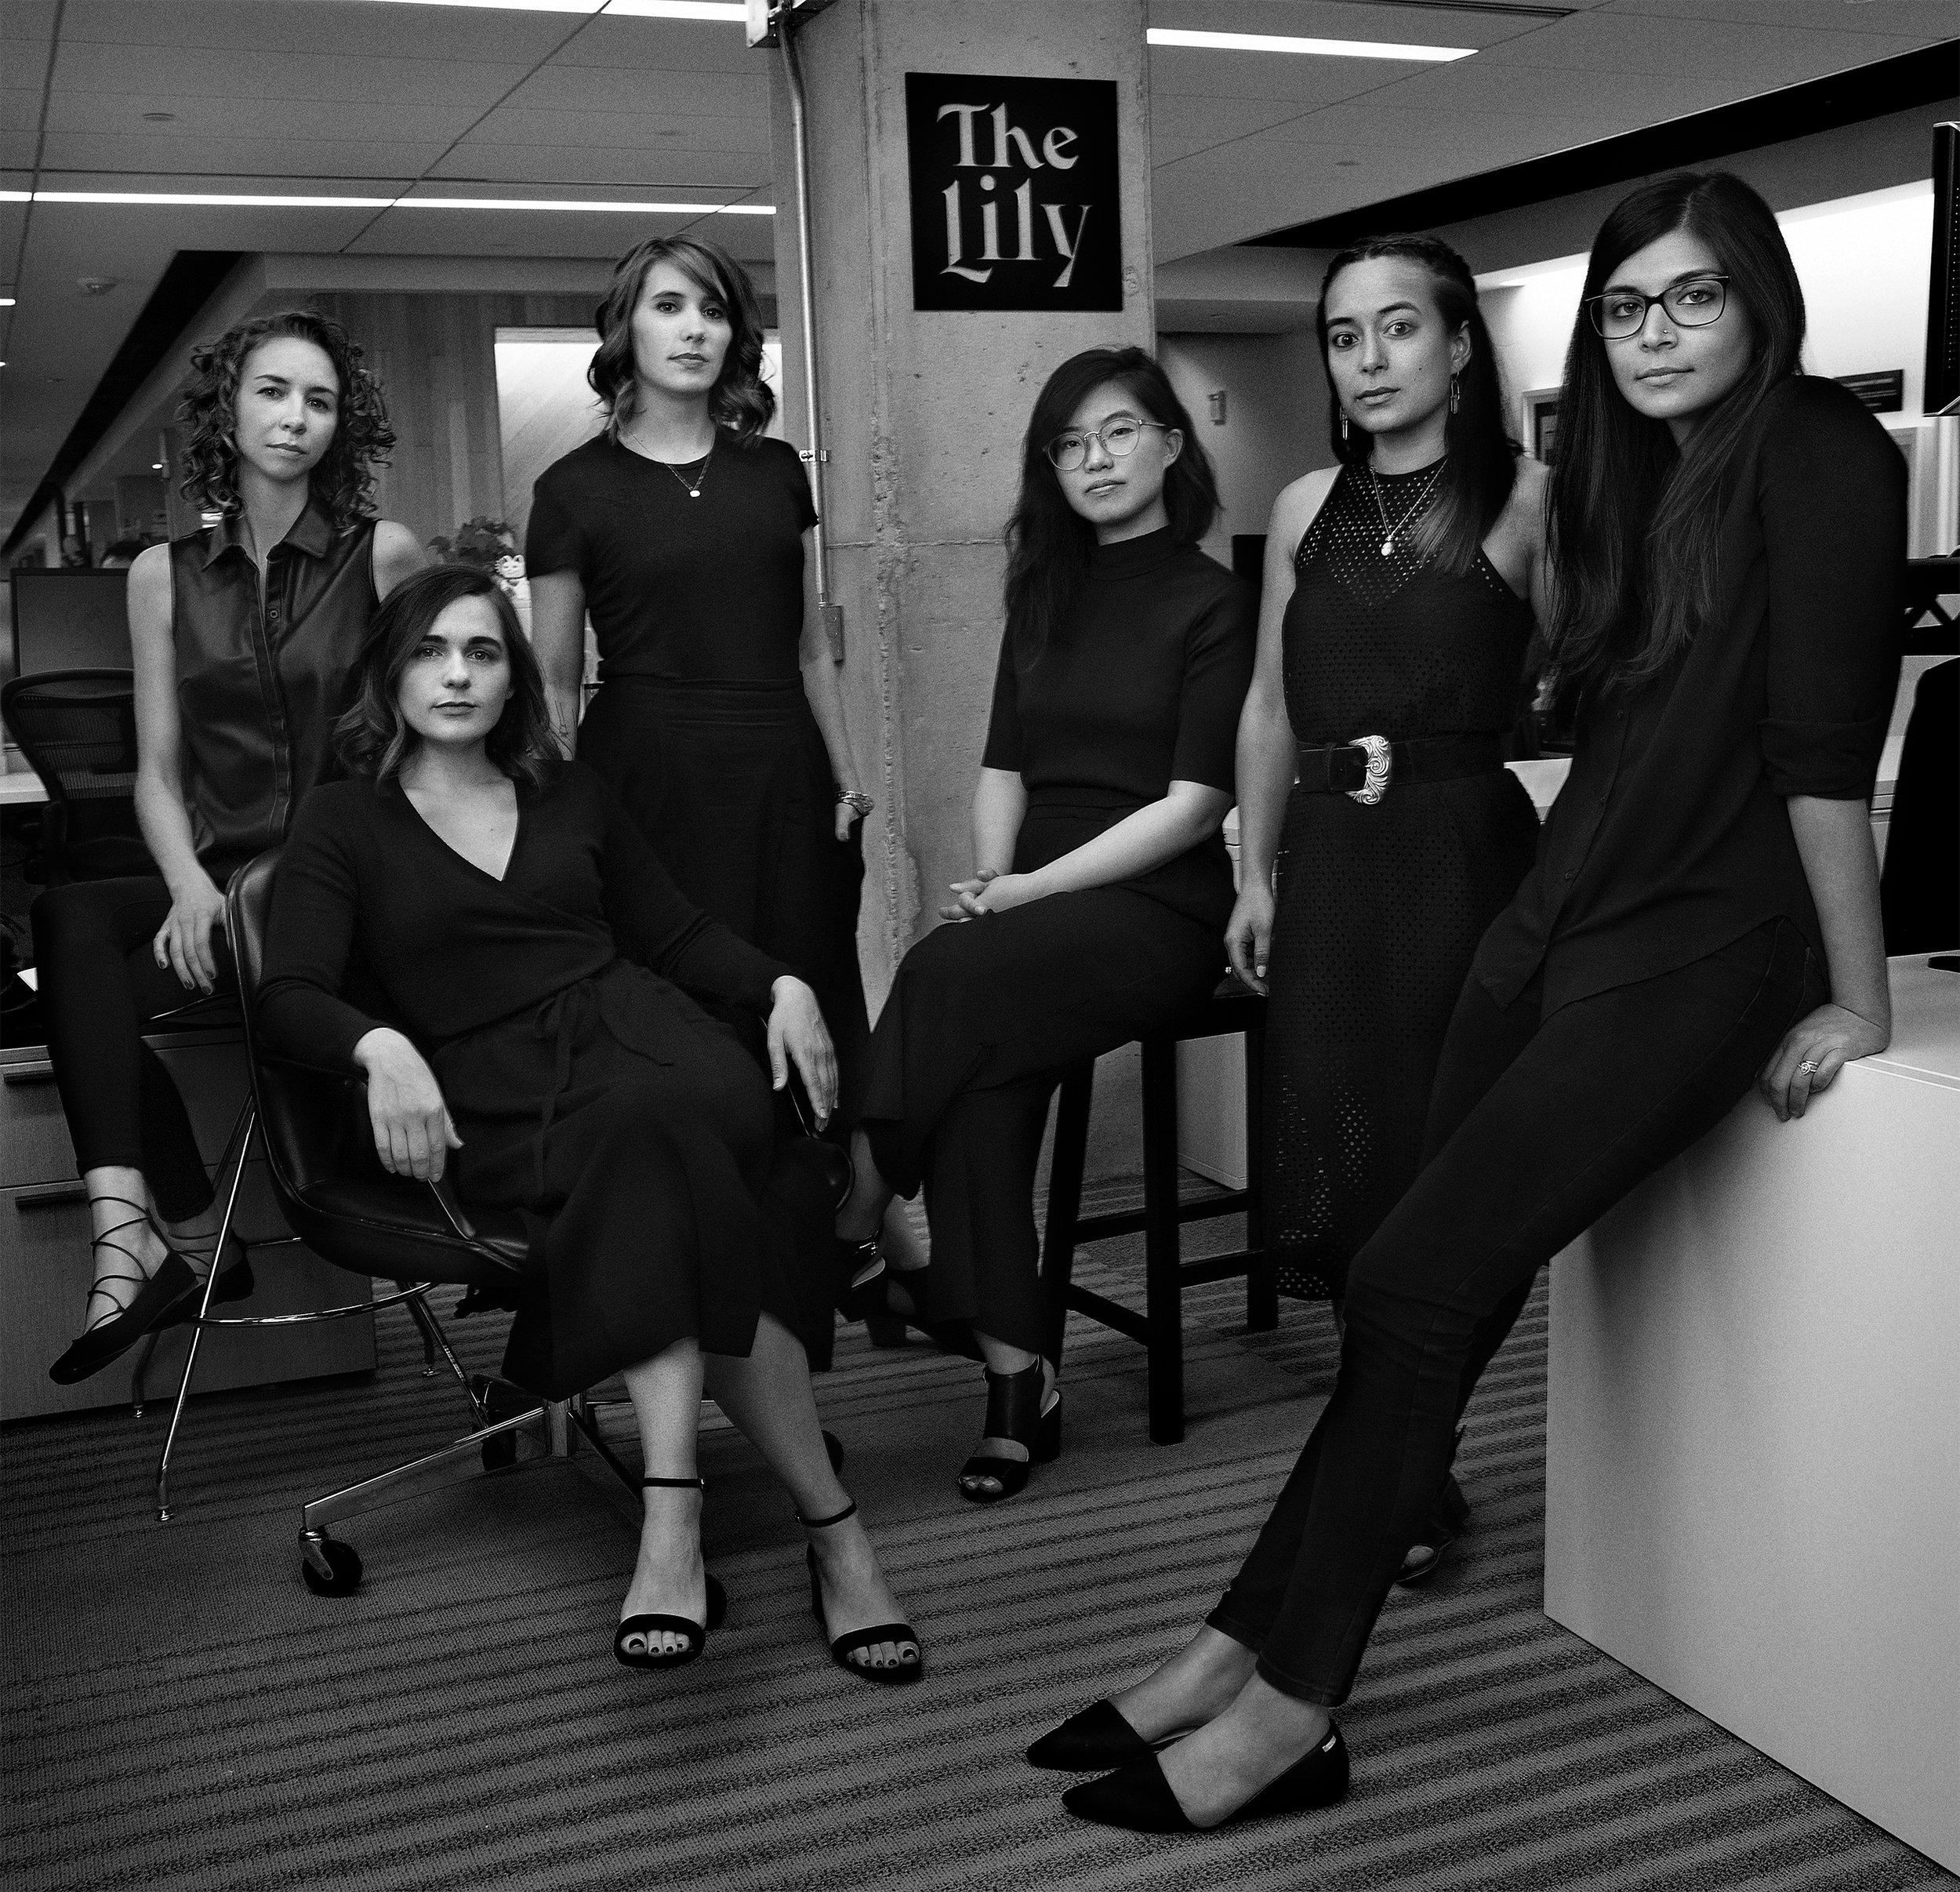 Left to right: Amy Cavenaile, Amy King, Rachel Orr, Carol Shih, Ashley Nguyen and Neema Roshania Patel. (Jesse Dittmar for The Lily)